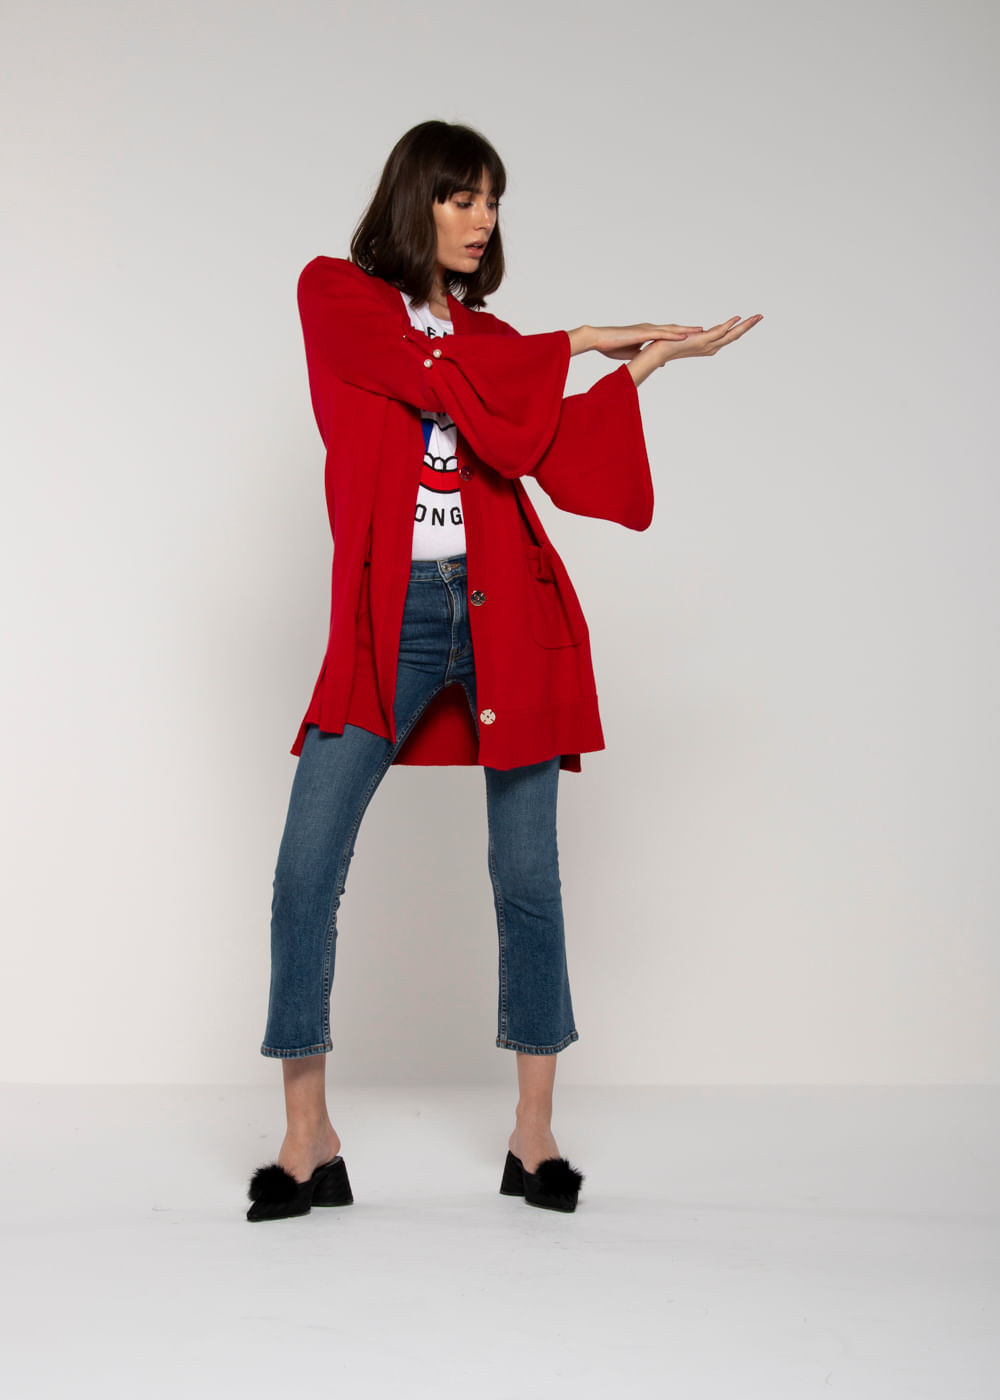 Cardigan Oversized Maudi Vermelha U